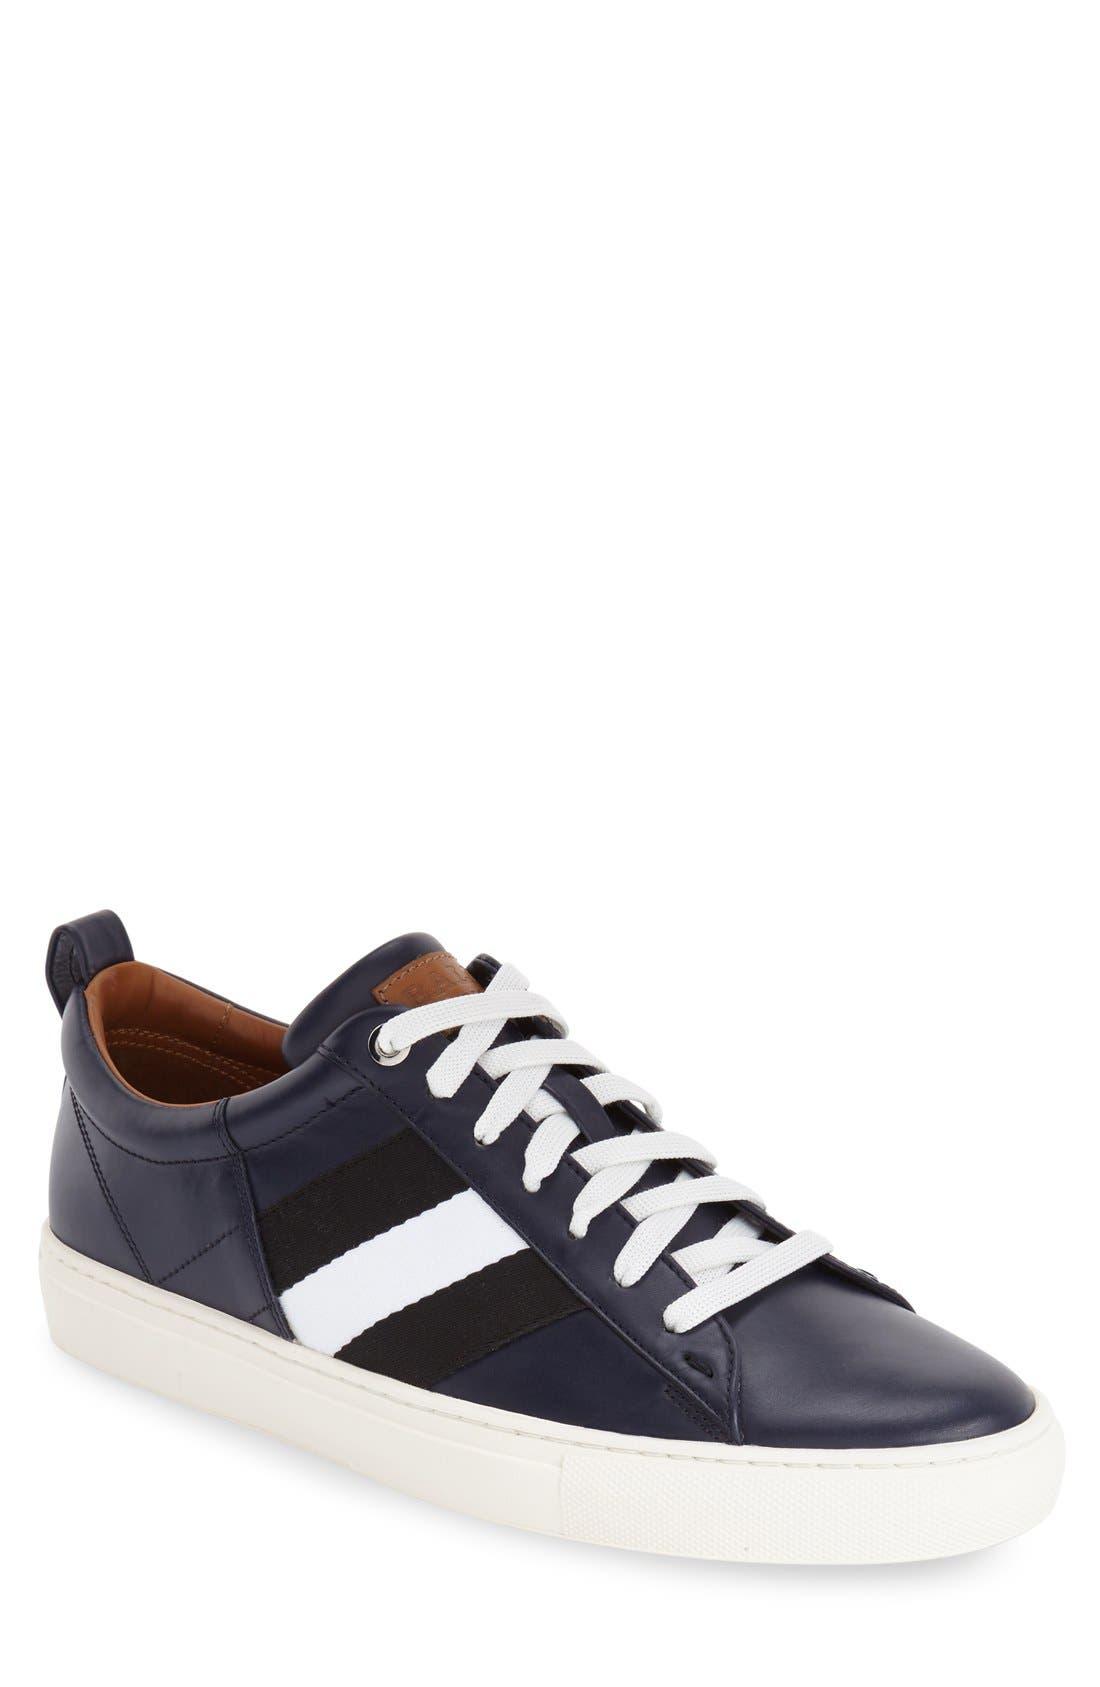 'Helvio' Sneaker,                             Main thumbnail 1, color,                             402